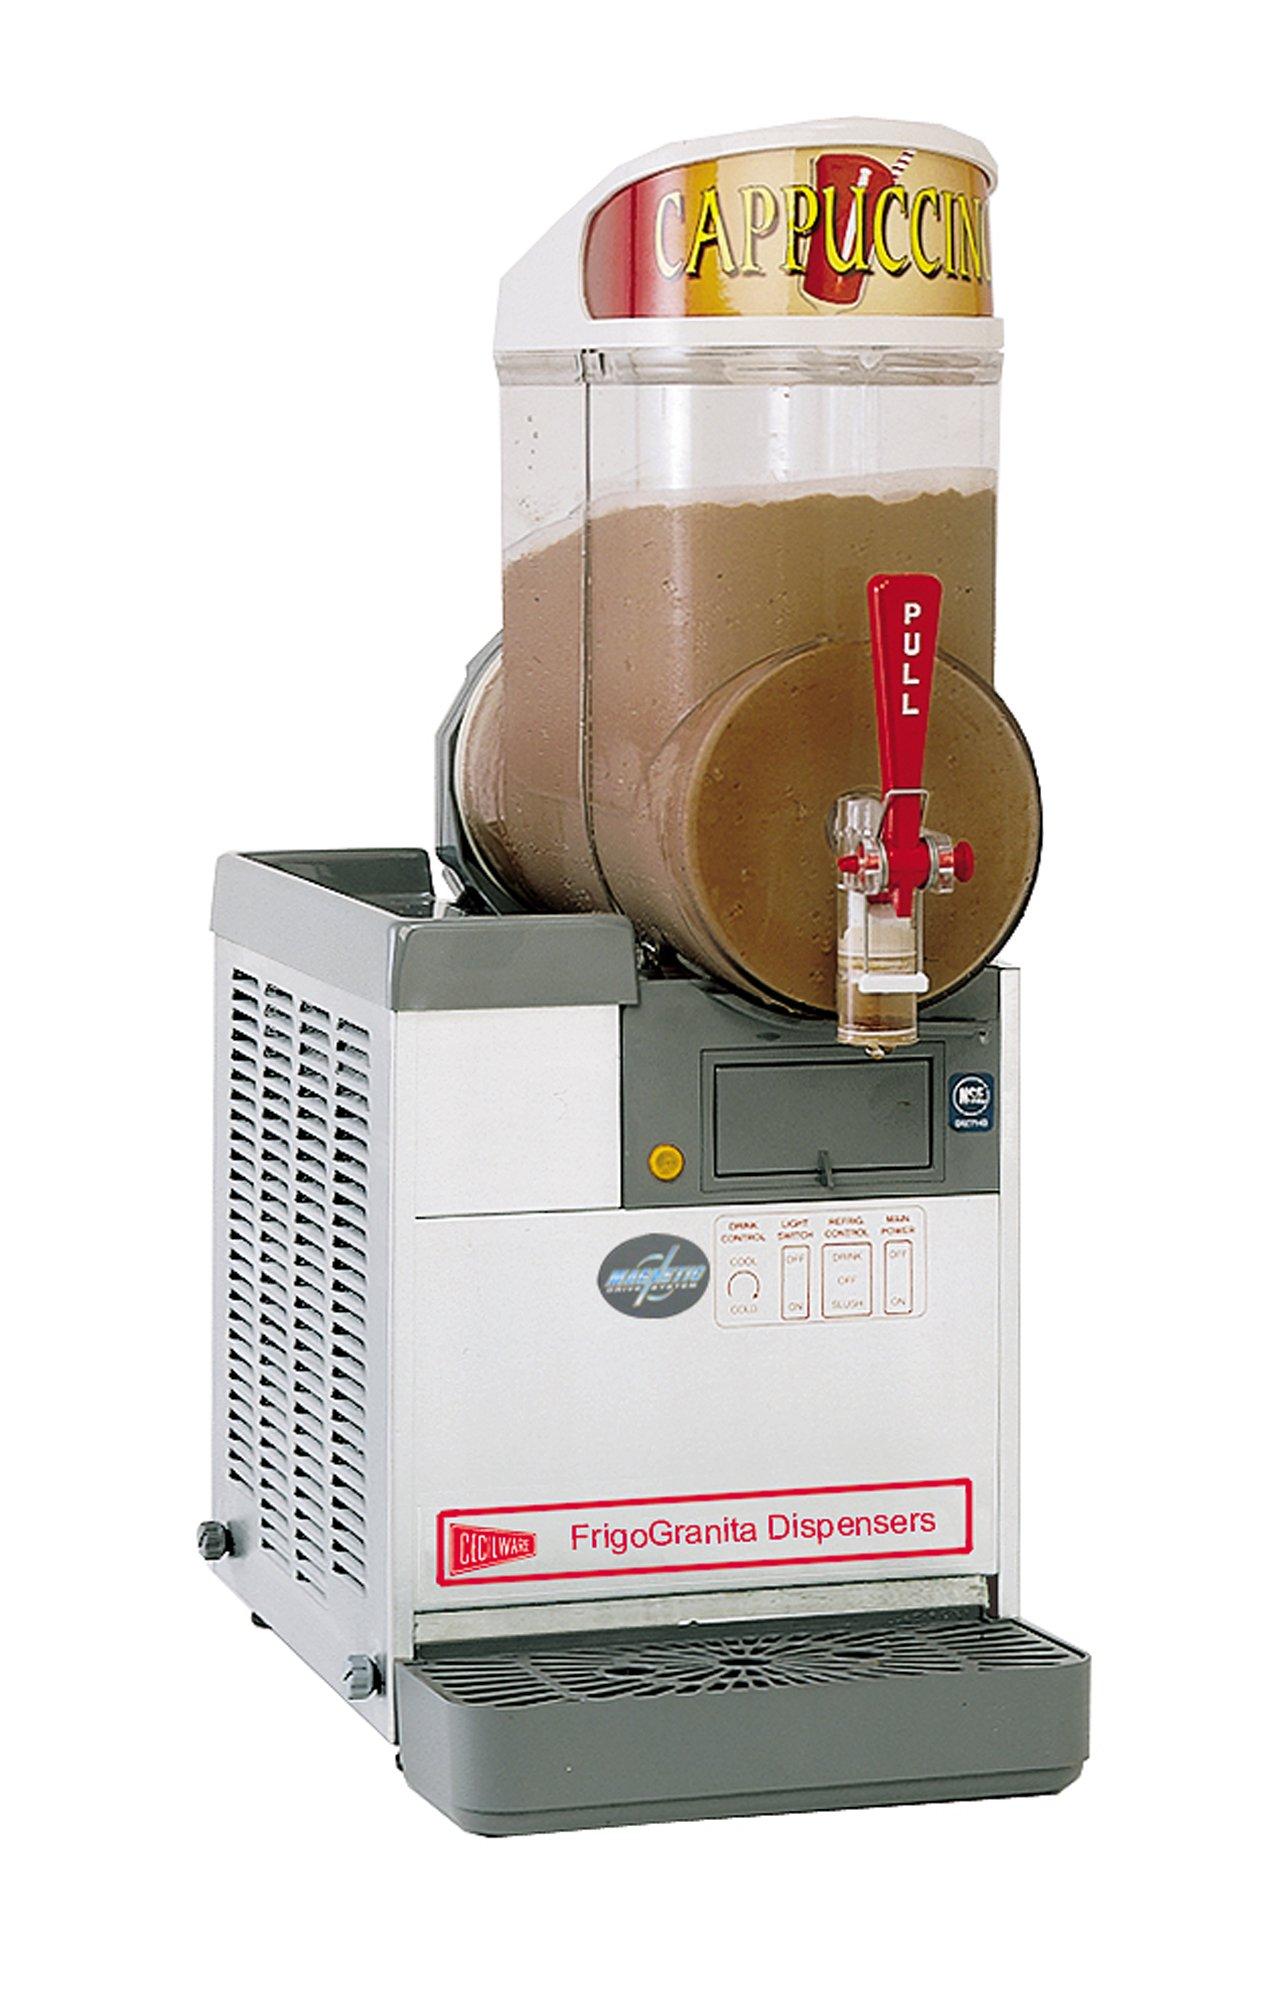 Grindmaster-Cecilware MT1PUL Stainless Steel FrigoGranita 2.5-Gallon Slush Dispenser, Single